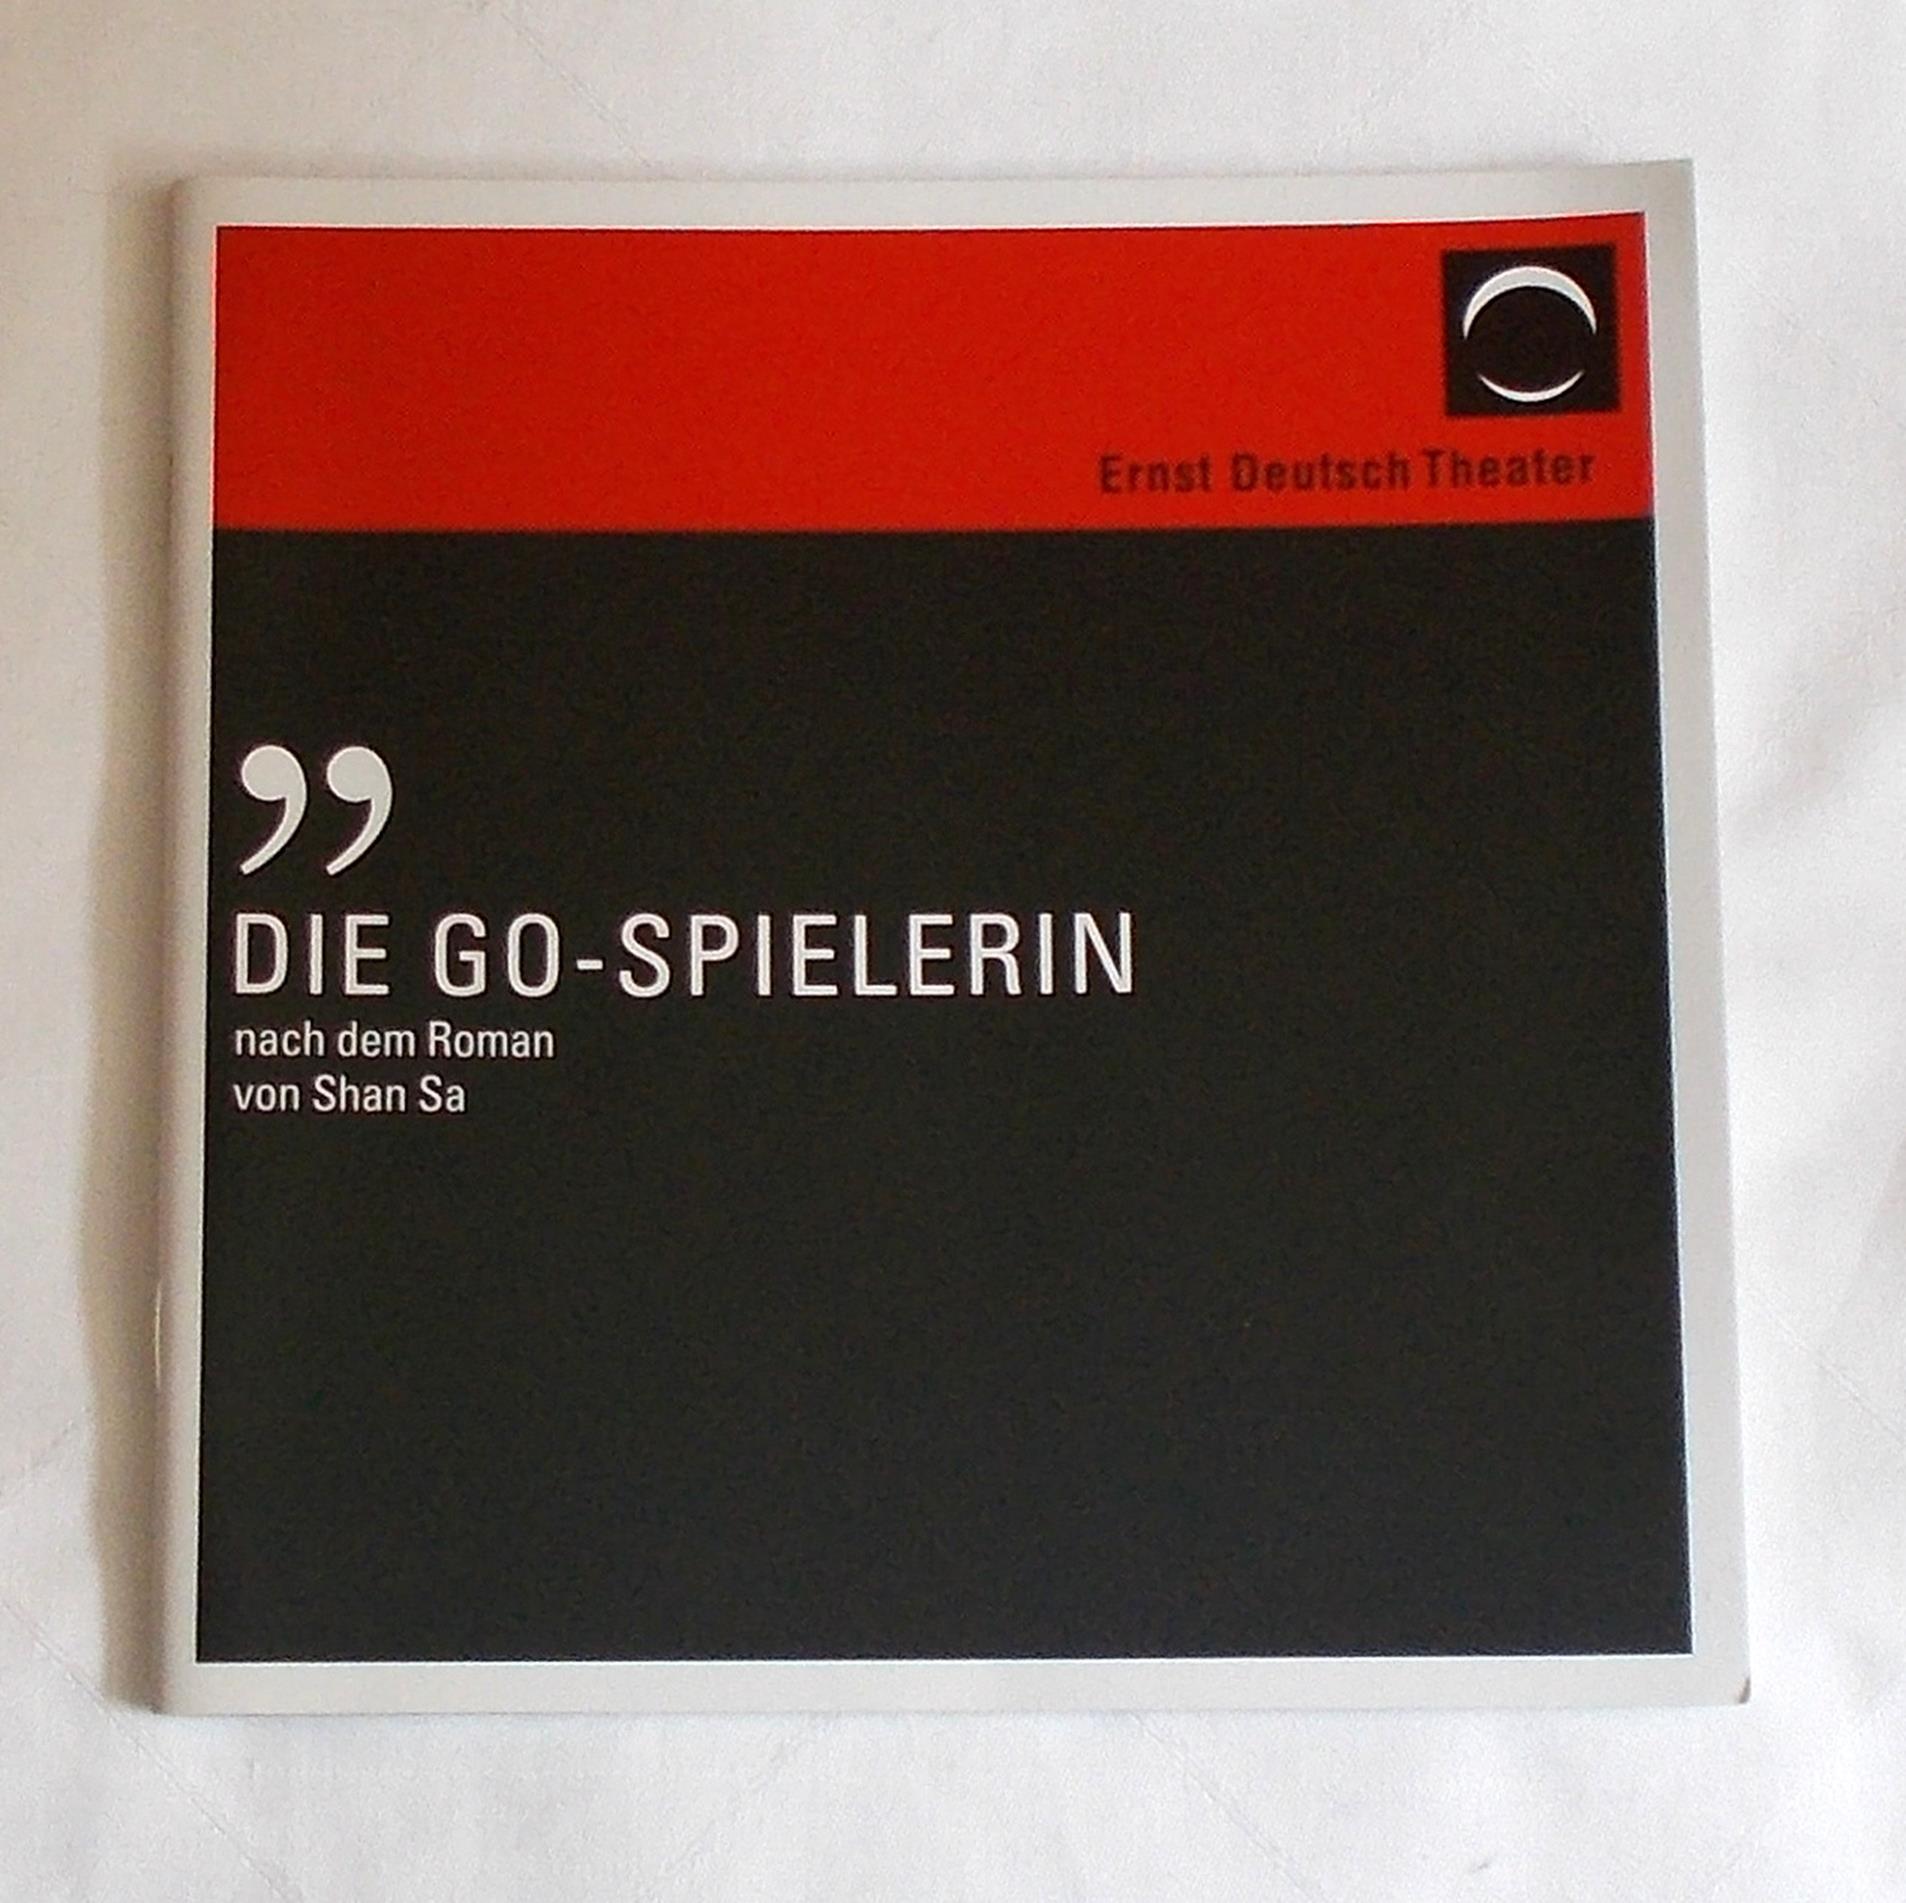 Programmheft Die GO-Spielerin ( La joueuse de go ). Ernst Deutsch Theater 2007